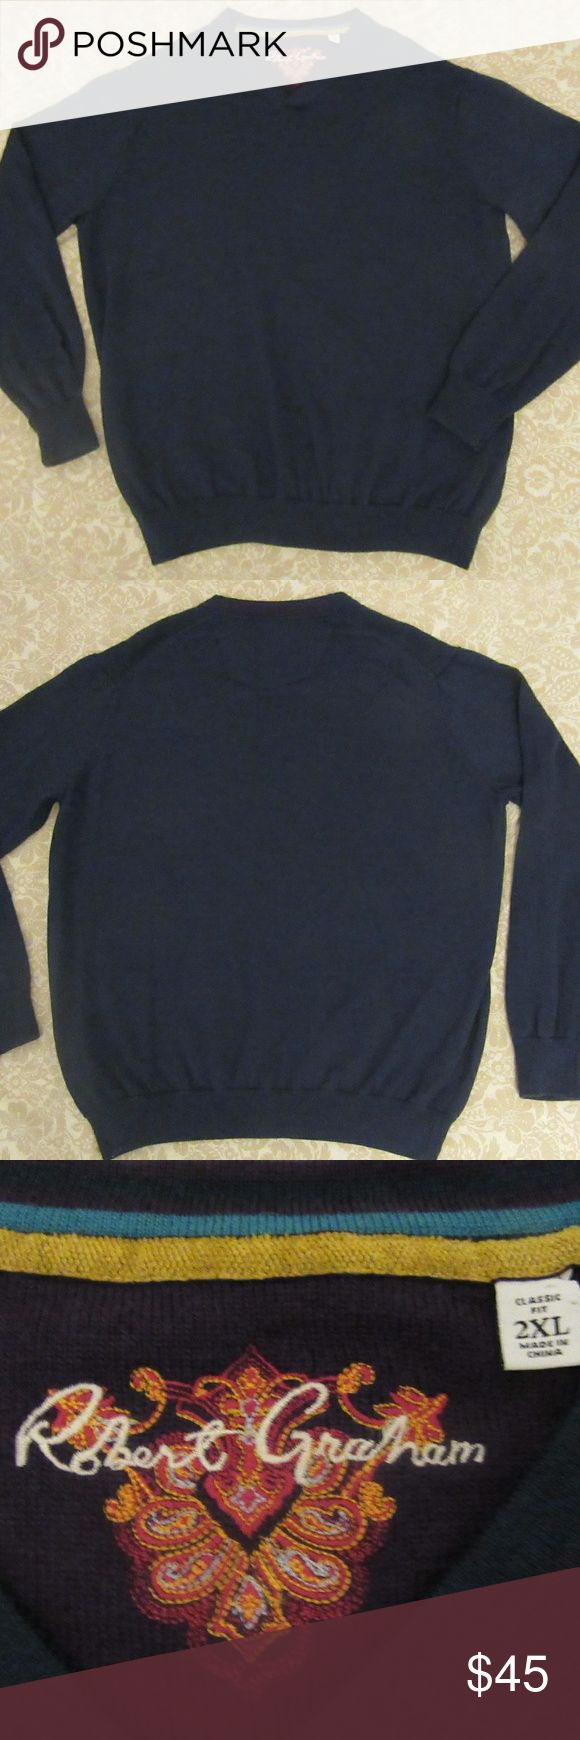 mens robert graham wool classic fit sweater 2XL excellent shape  mens robert graham wool classic fit sweater 2XL   pit to pit 24.5  shoulder to shoulder 19  top to bottom 29  shoulder to cuff 26 Robert Graham Sweaters V-Neck